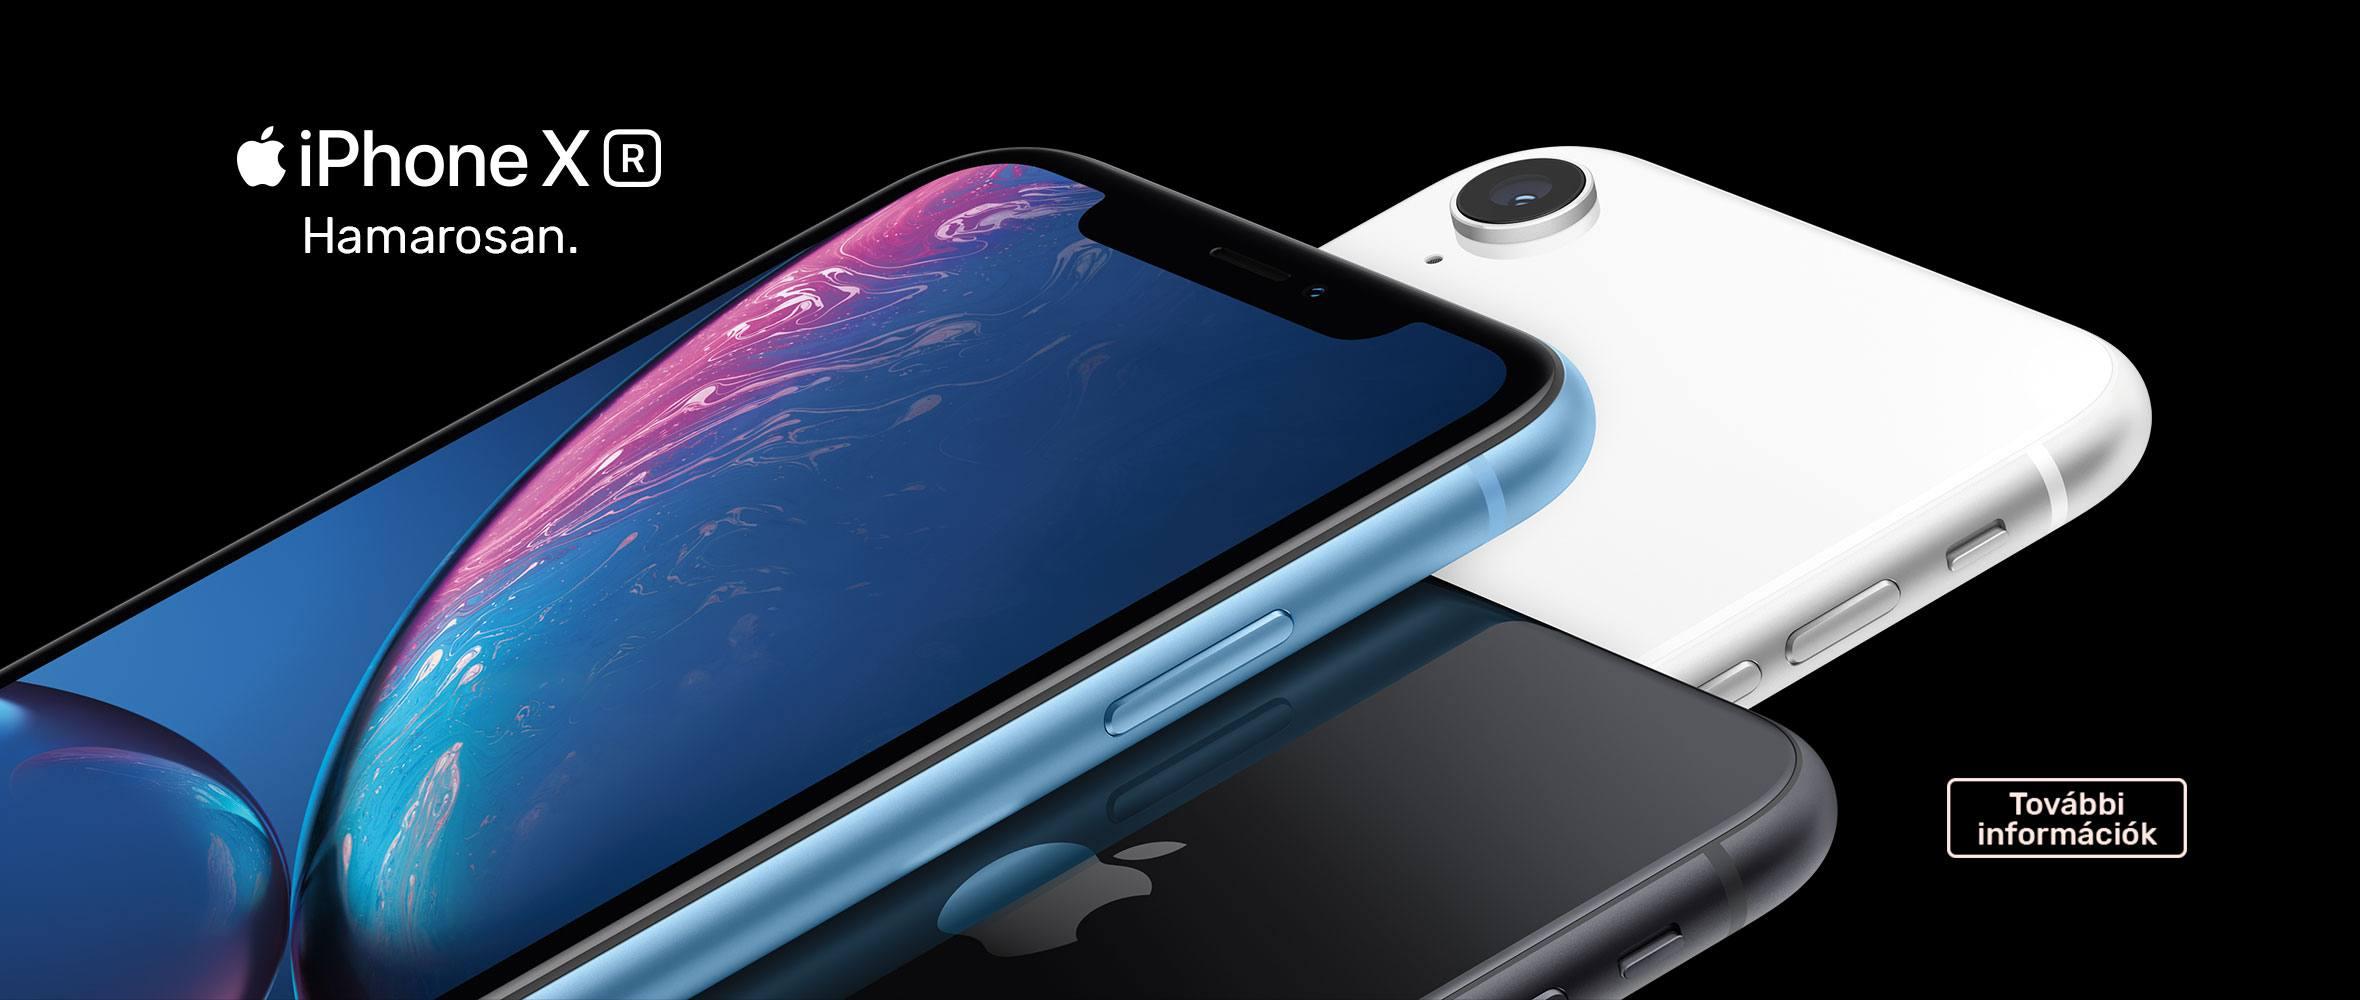 iPhone XR - Hamarosan